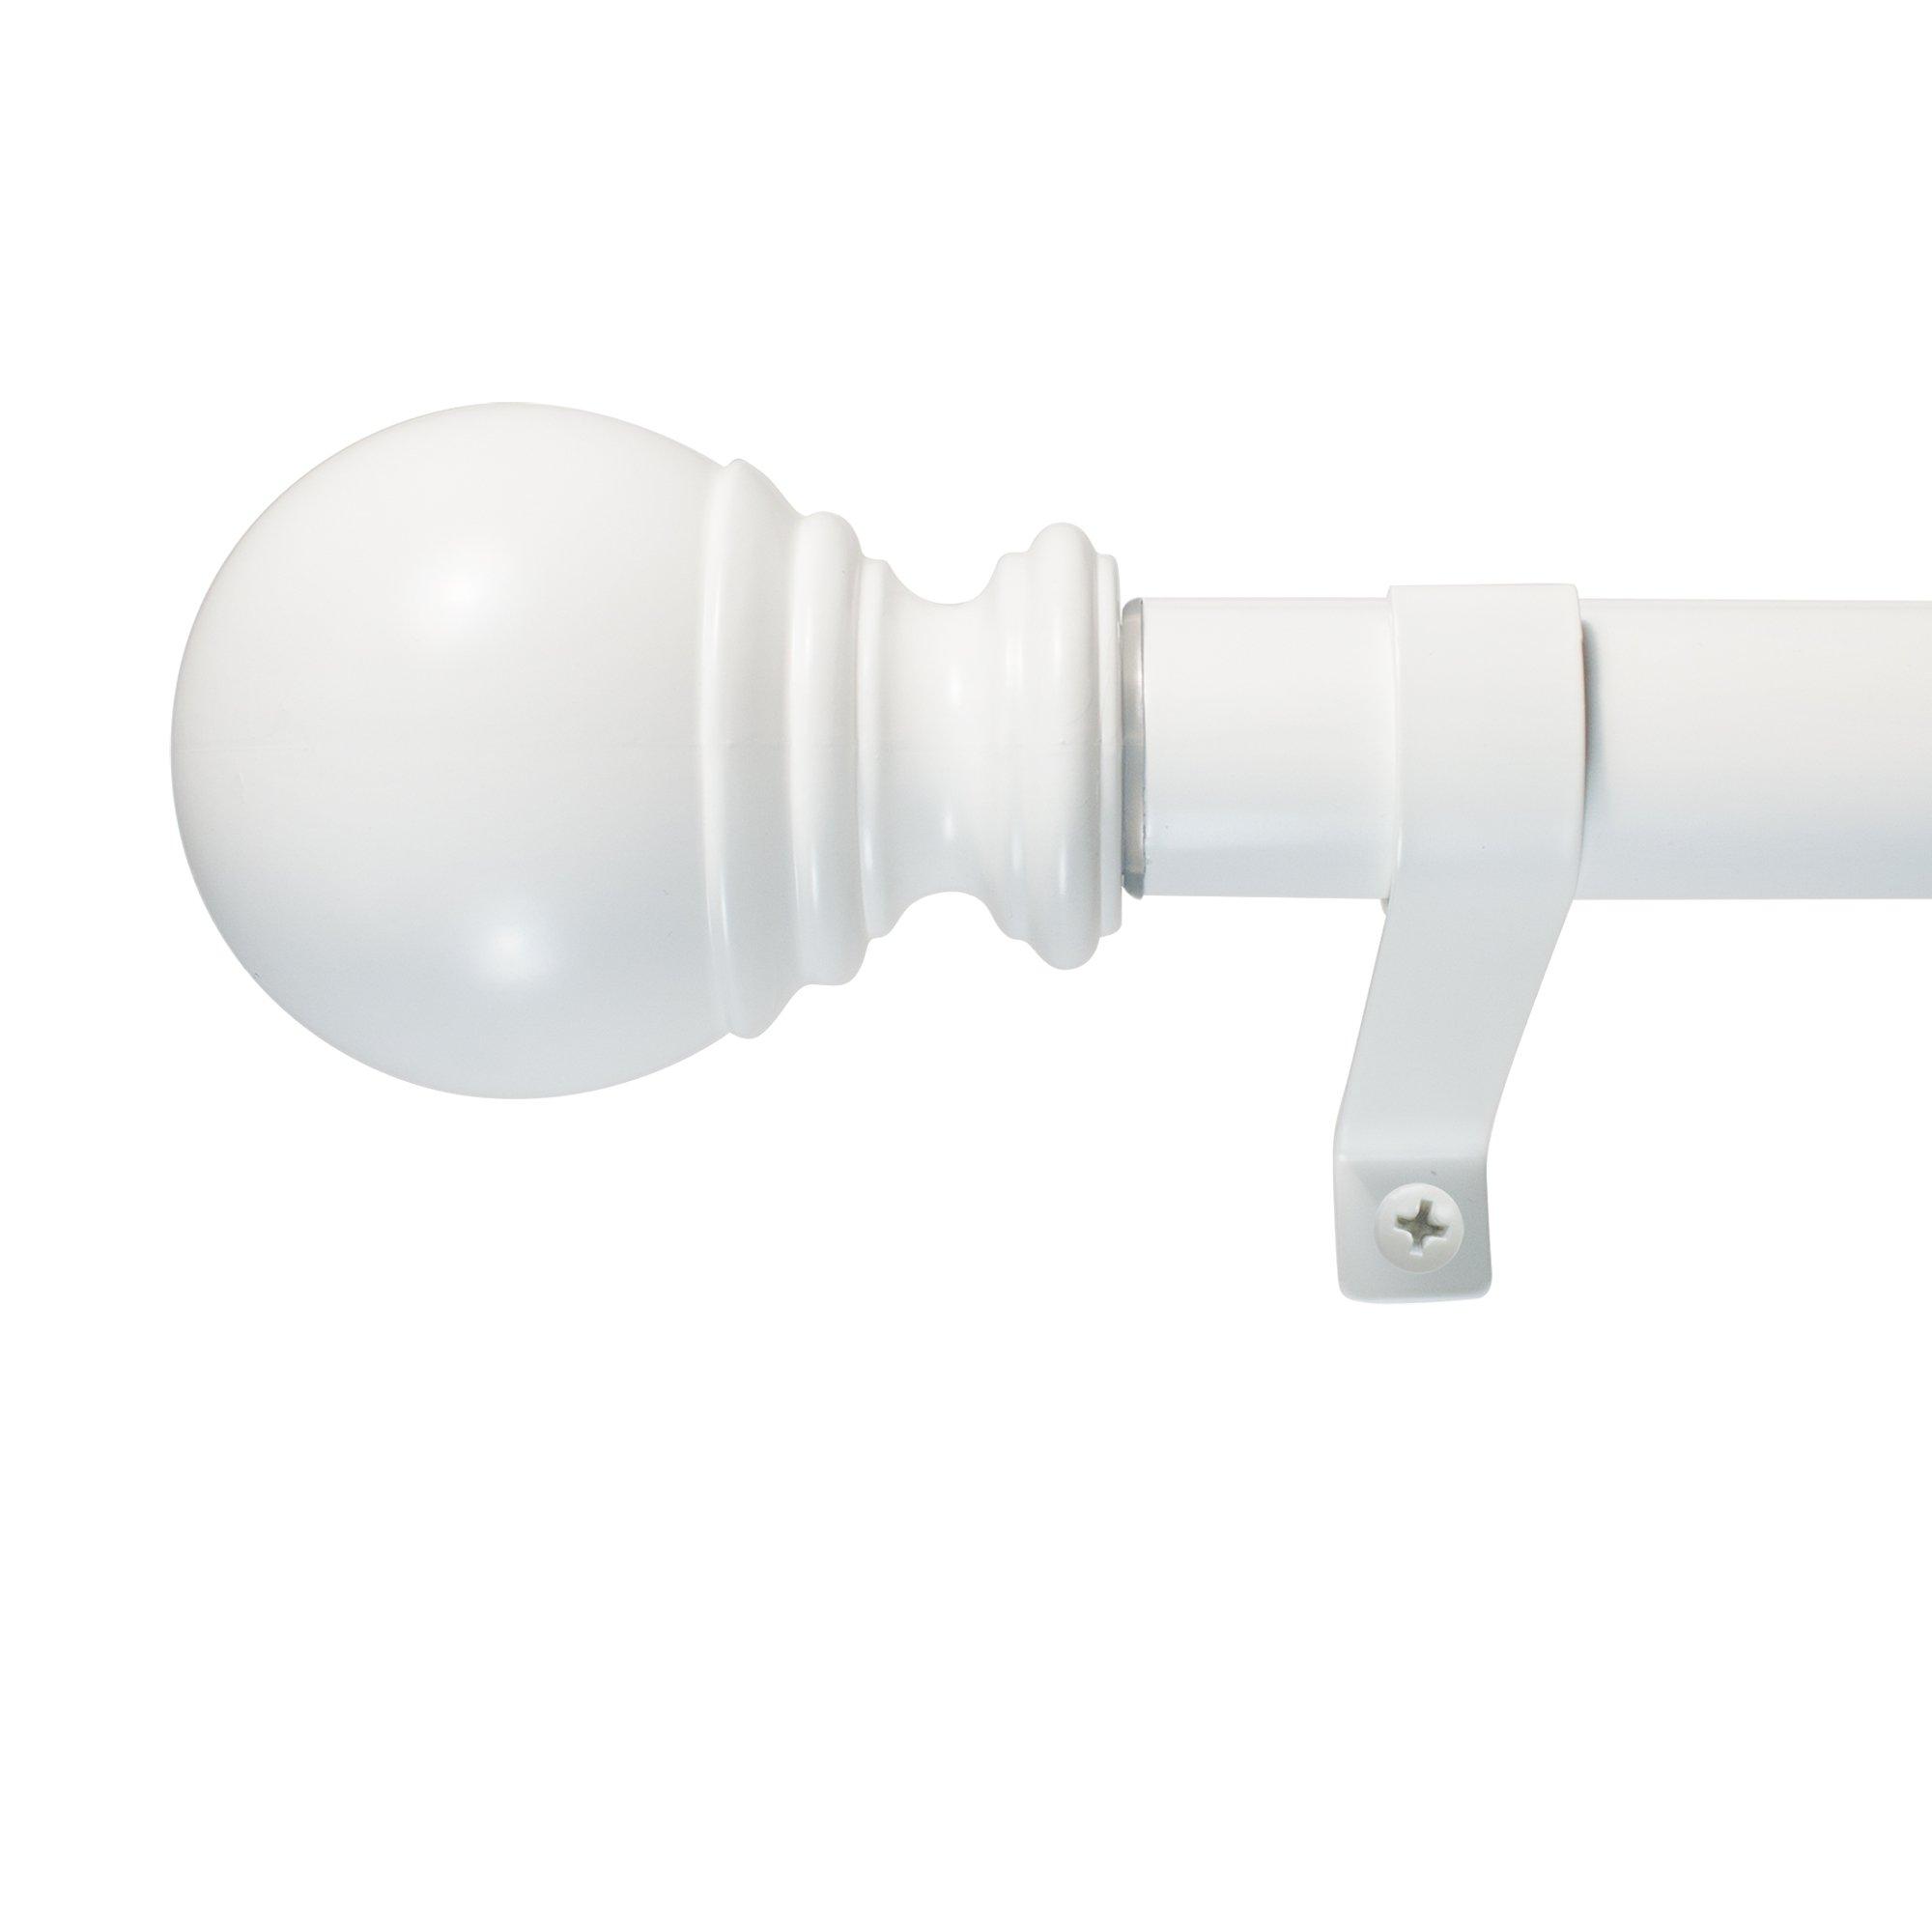 Decopolitan Ball Single Telescoping Drapery Rod Set, Short, White